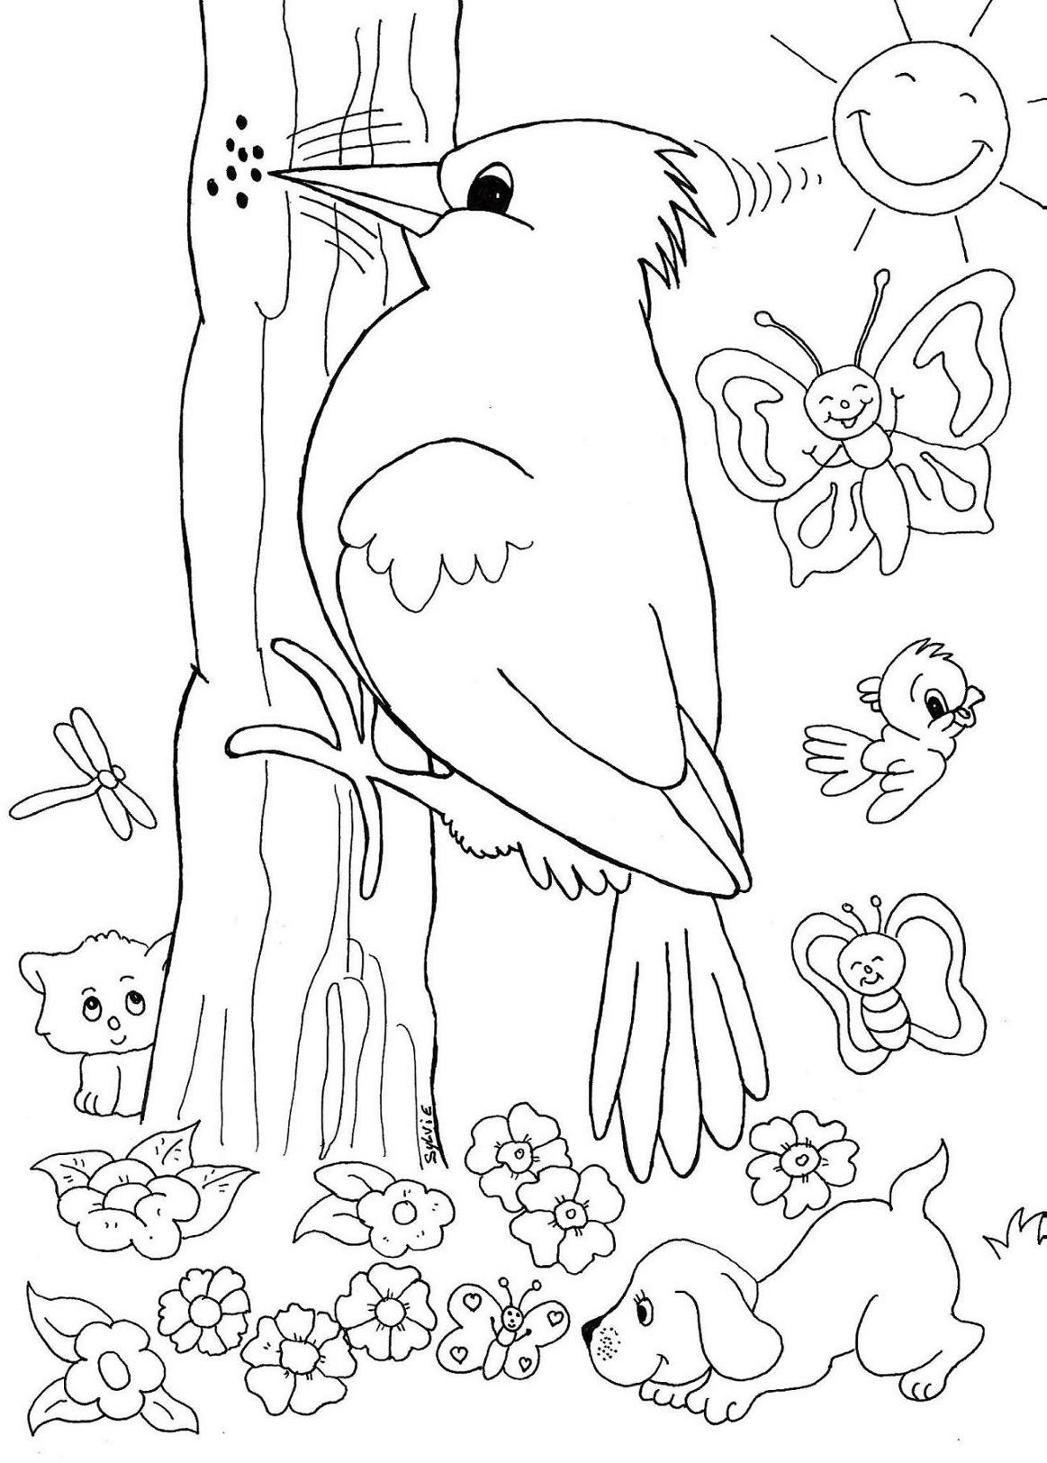 Desenhos Colorir Passaros 8 Passaro Desenho Cores Disney